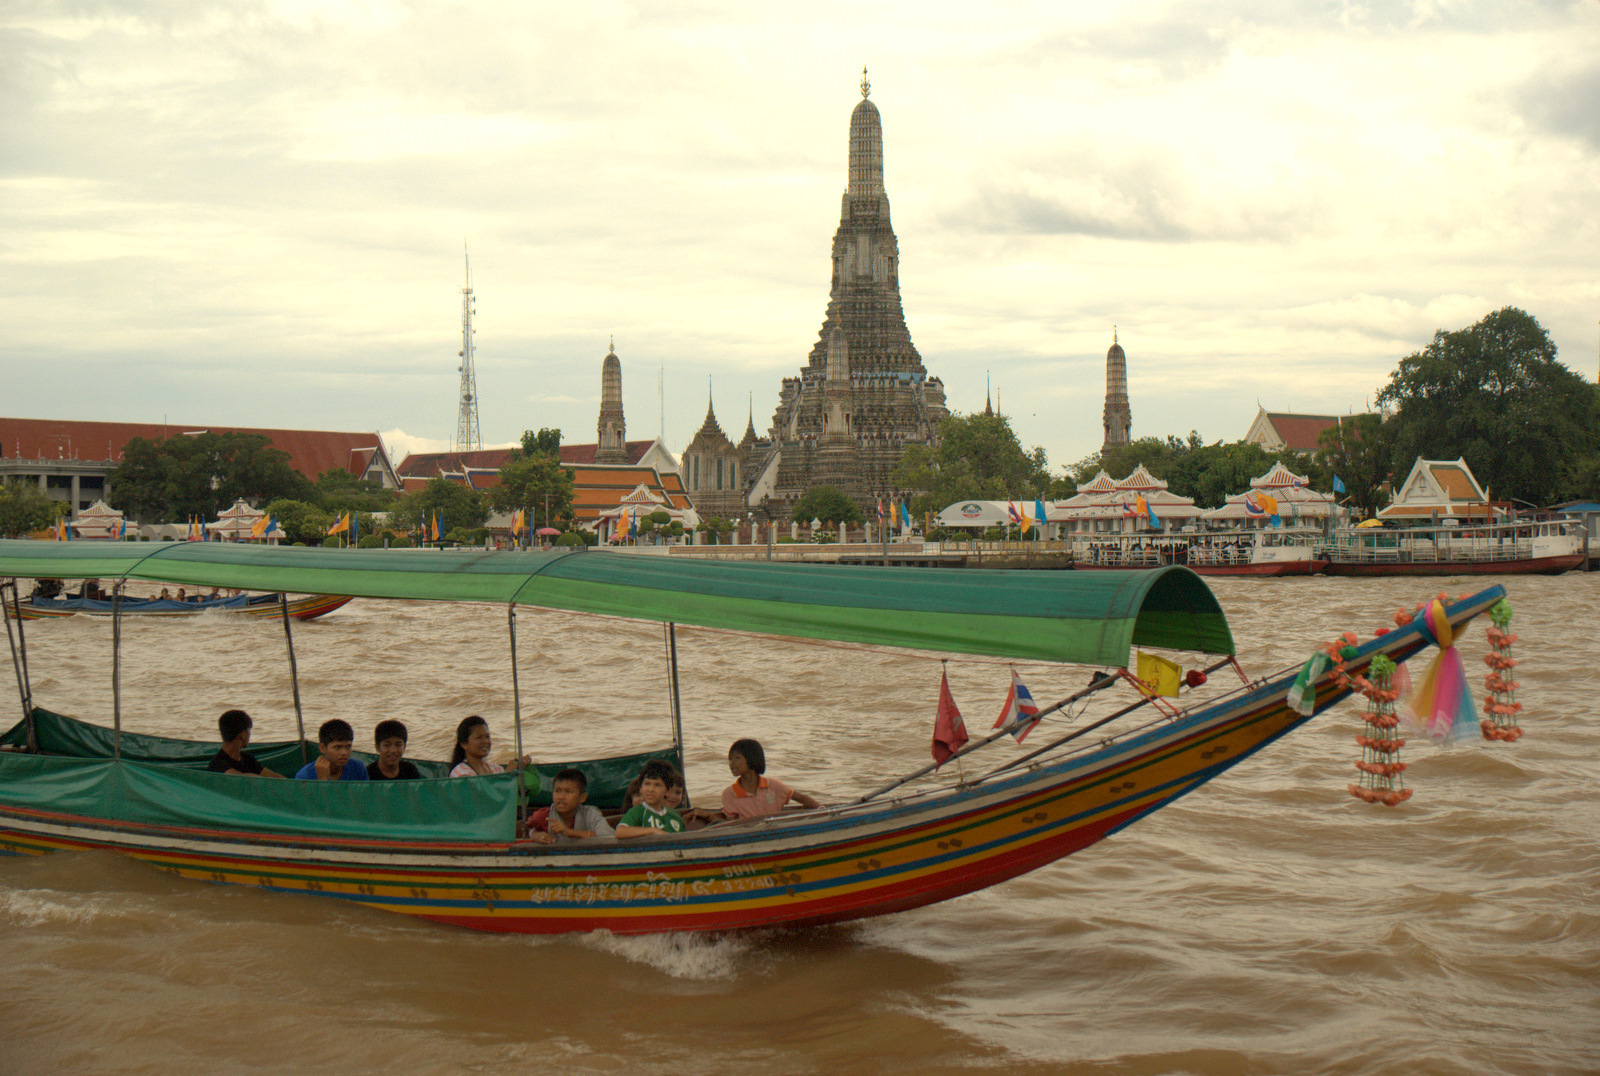 Bangkok (ostatni spacer autobusem i rzeką) 19